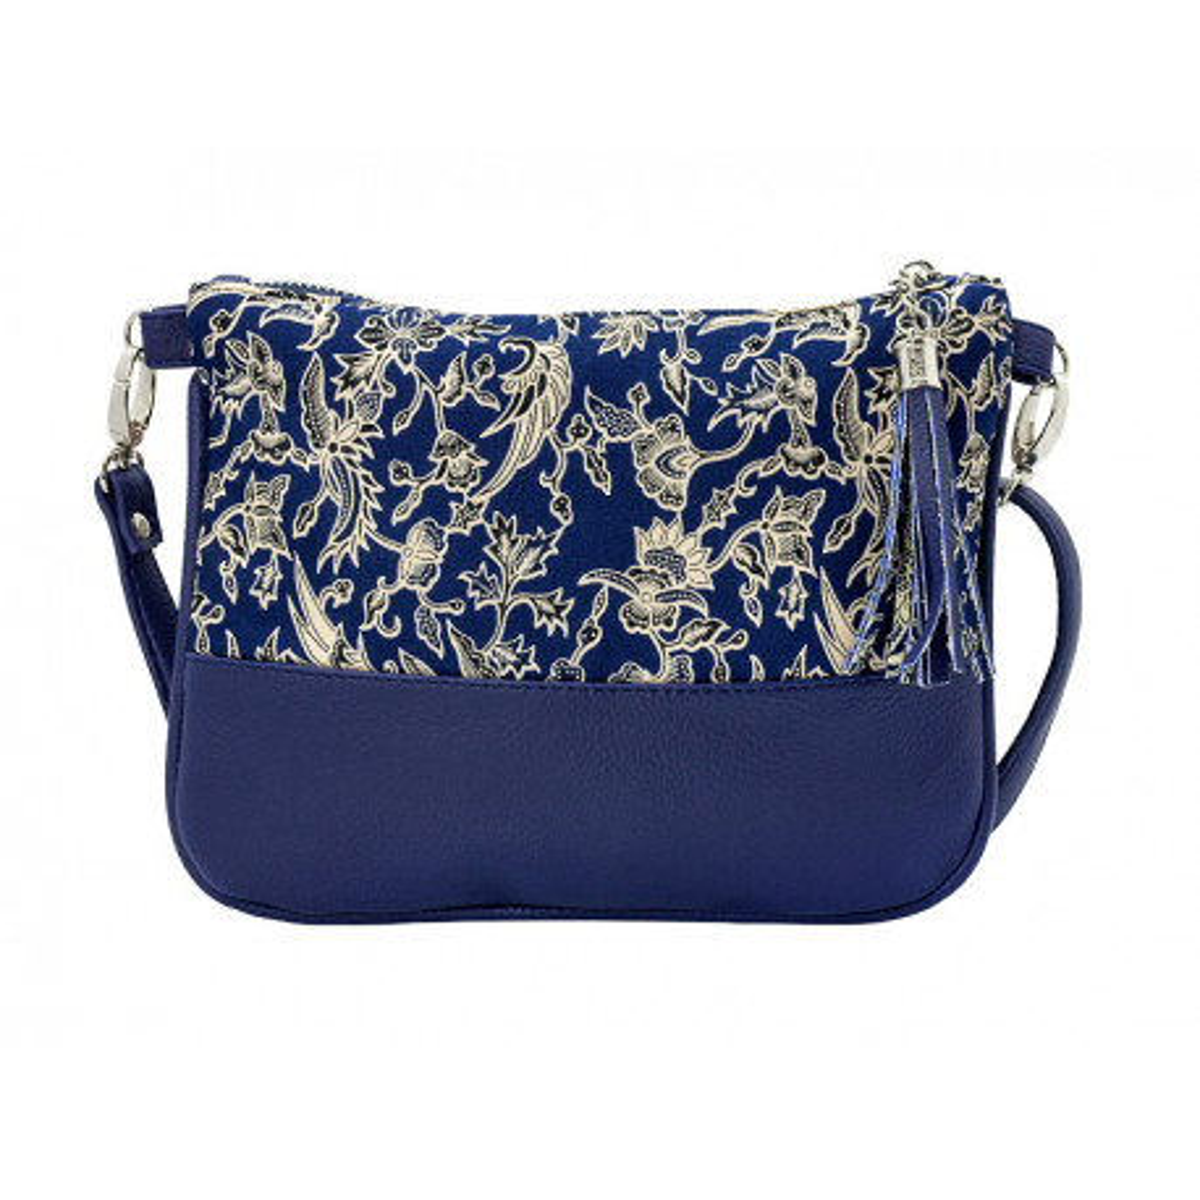 Sac à main pochette femme bleu indigo